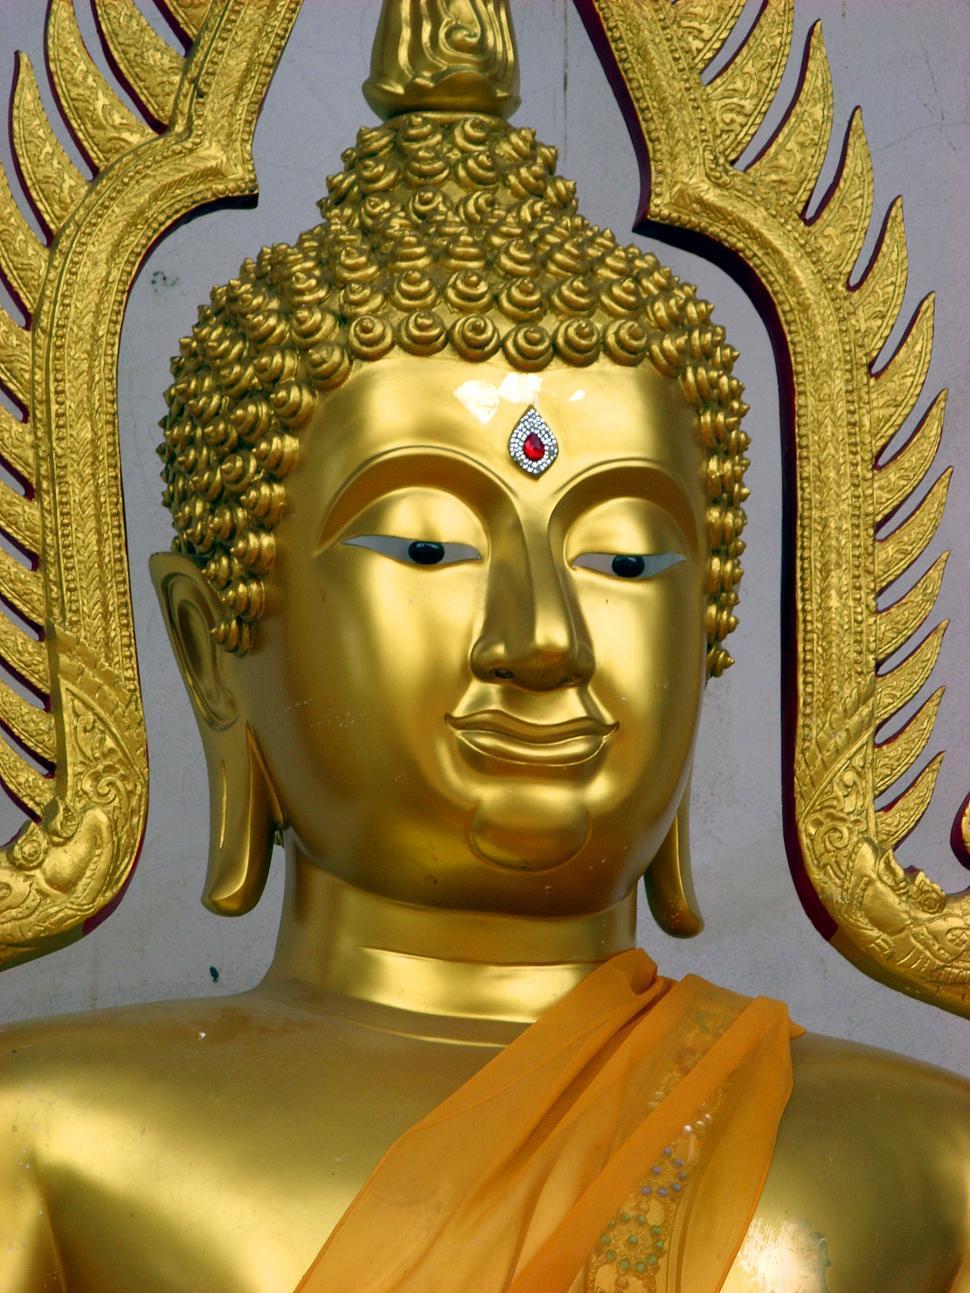 Download Free Stock Photo of Buddha